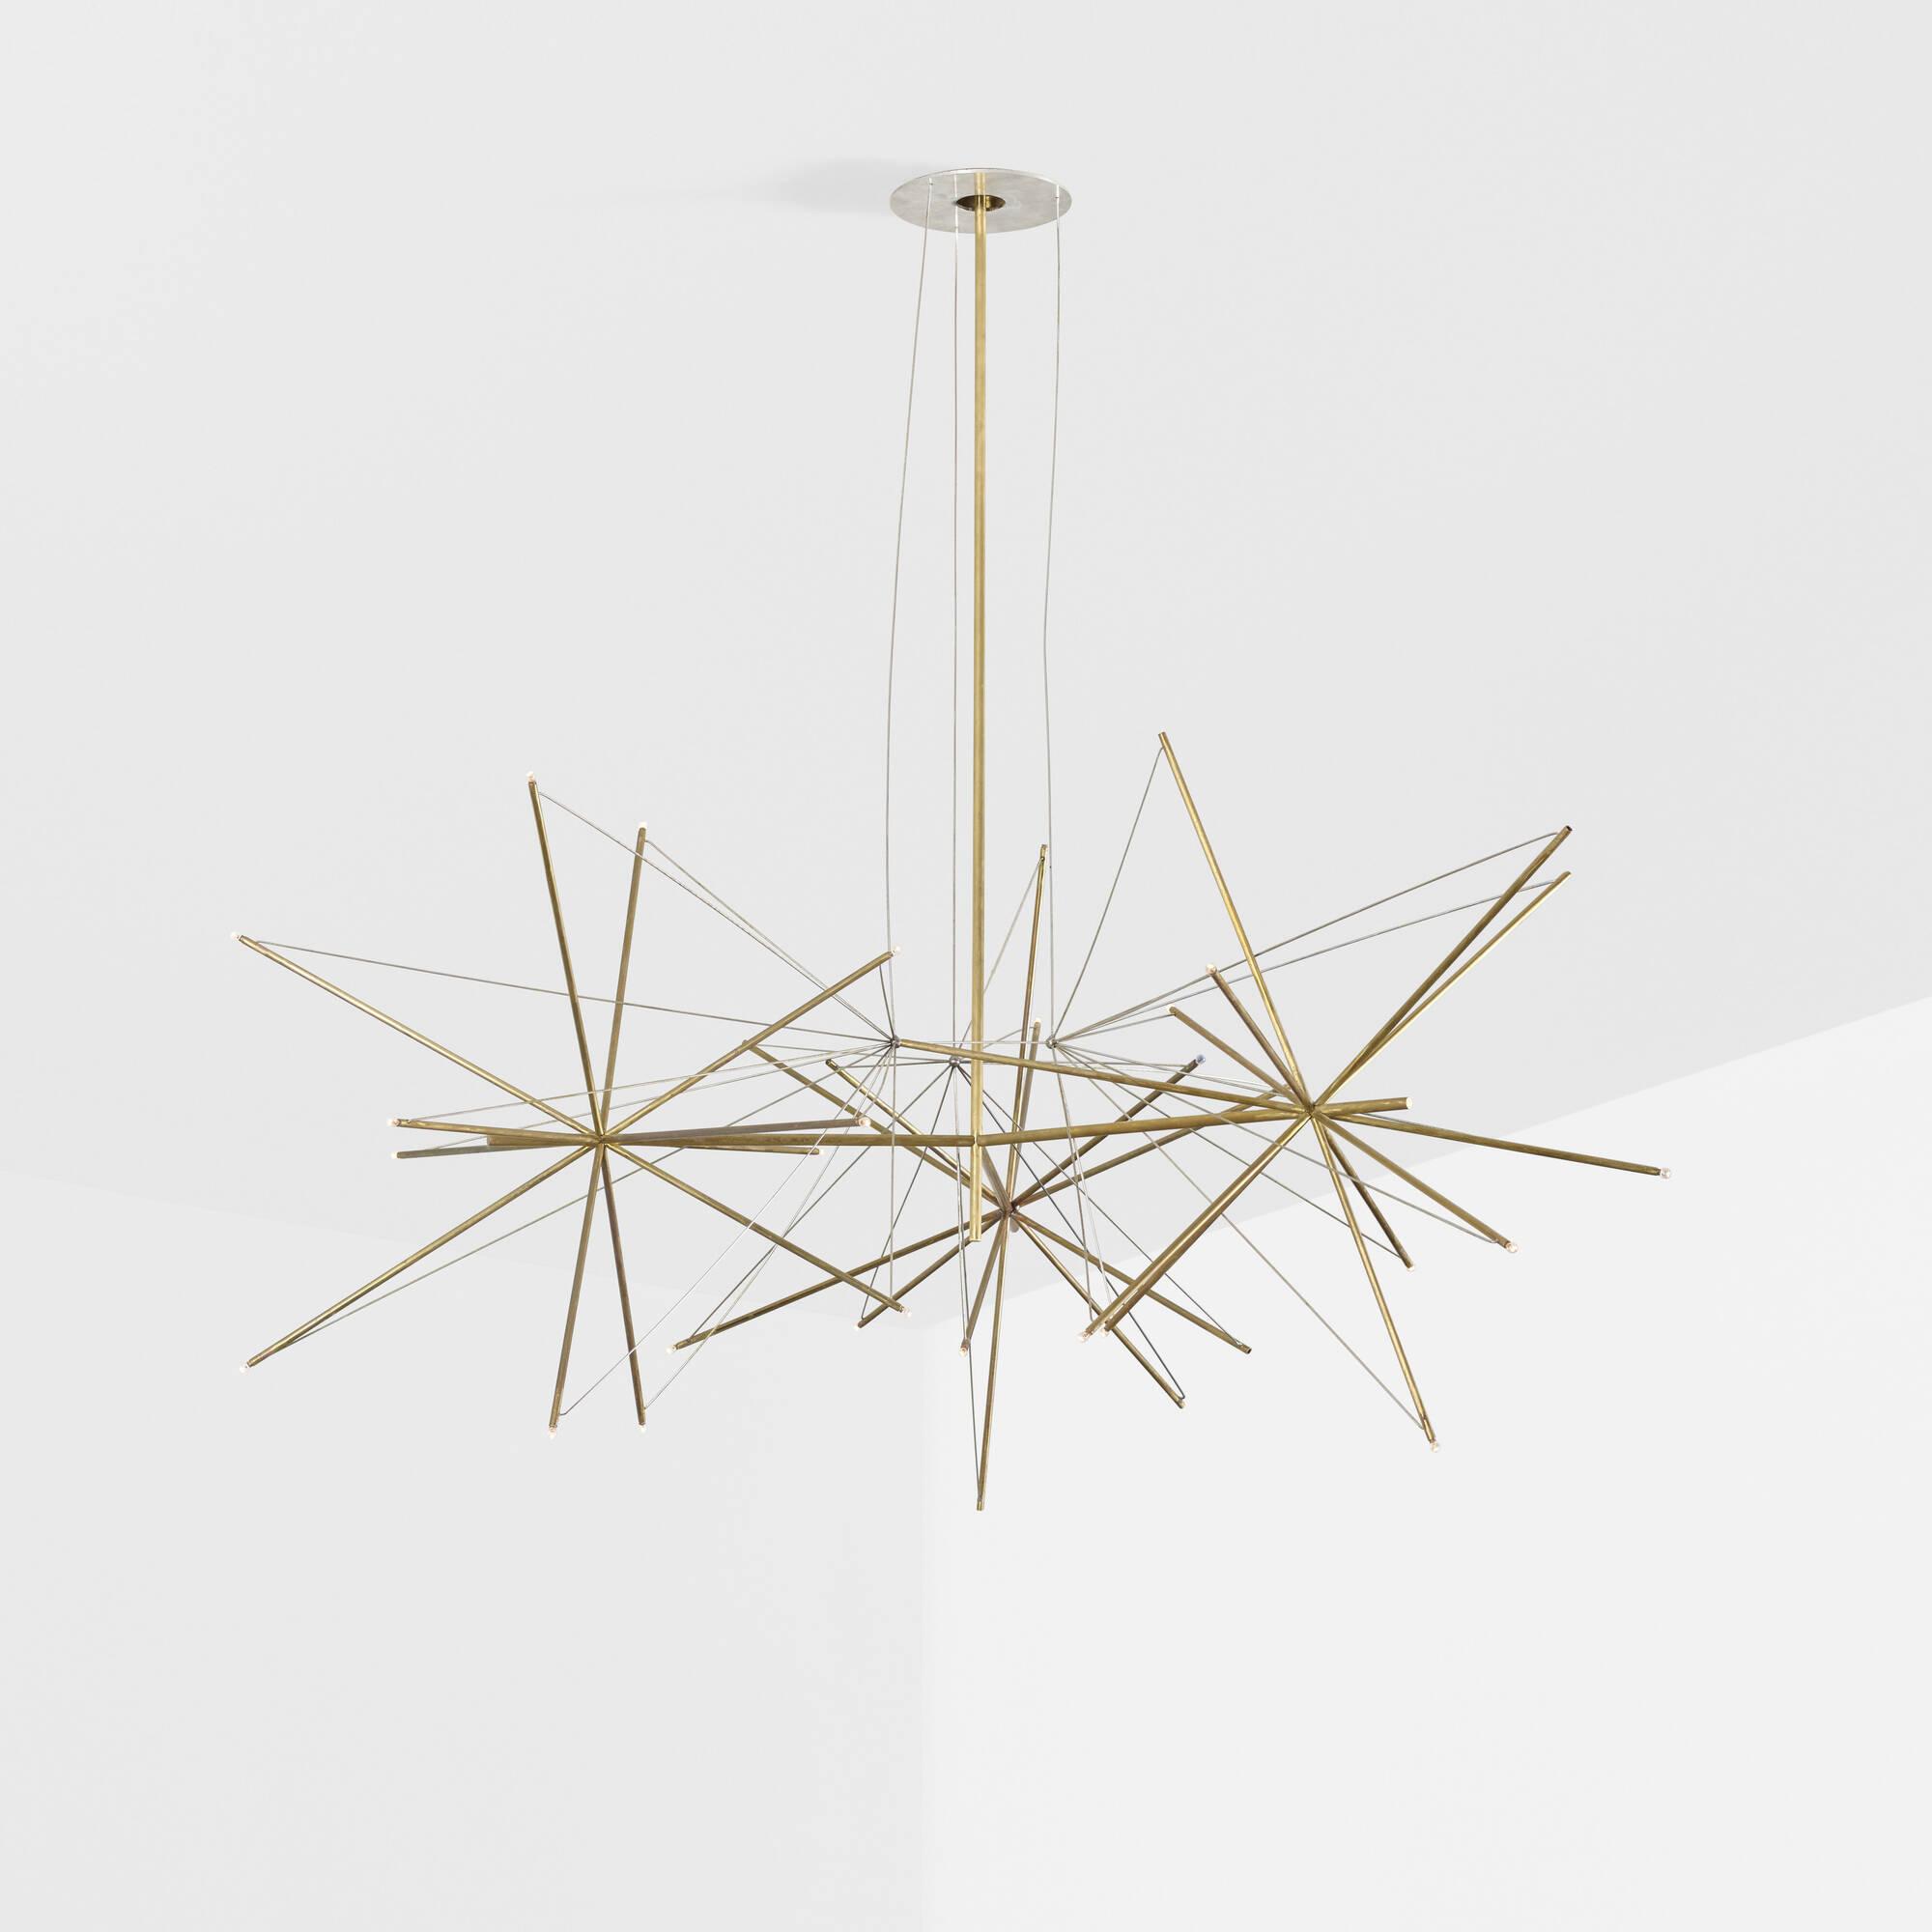 343: American / custom chandelier for the Washburn Residence (2 of 3)